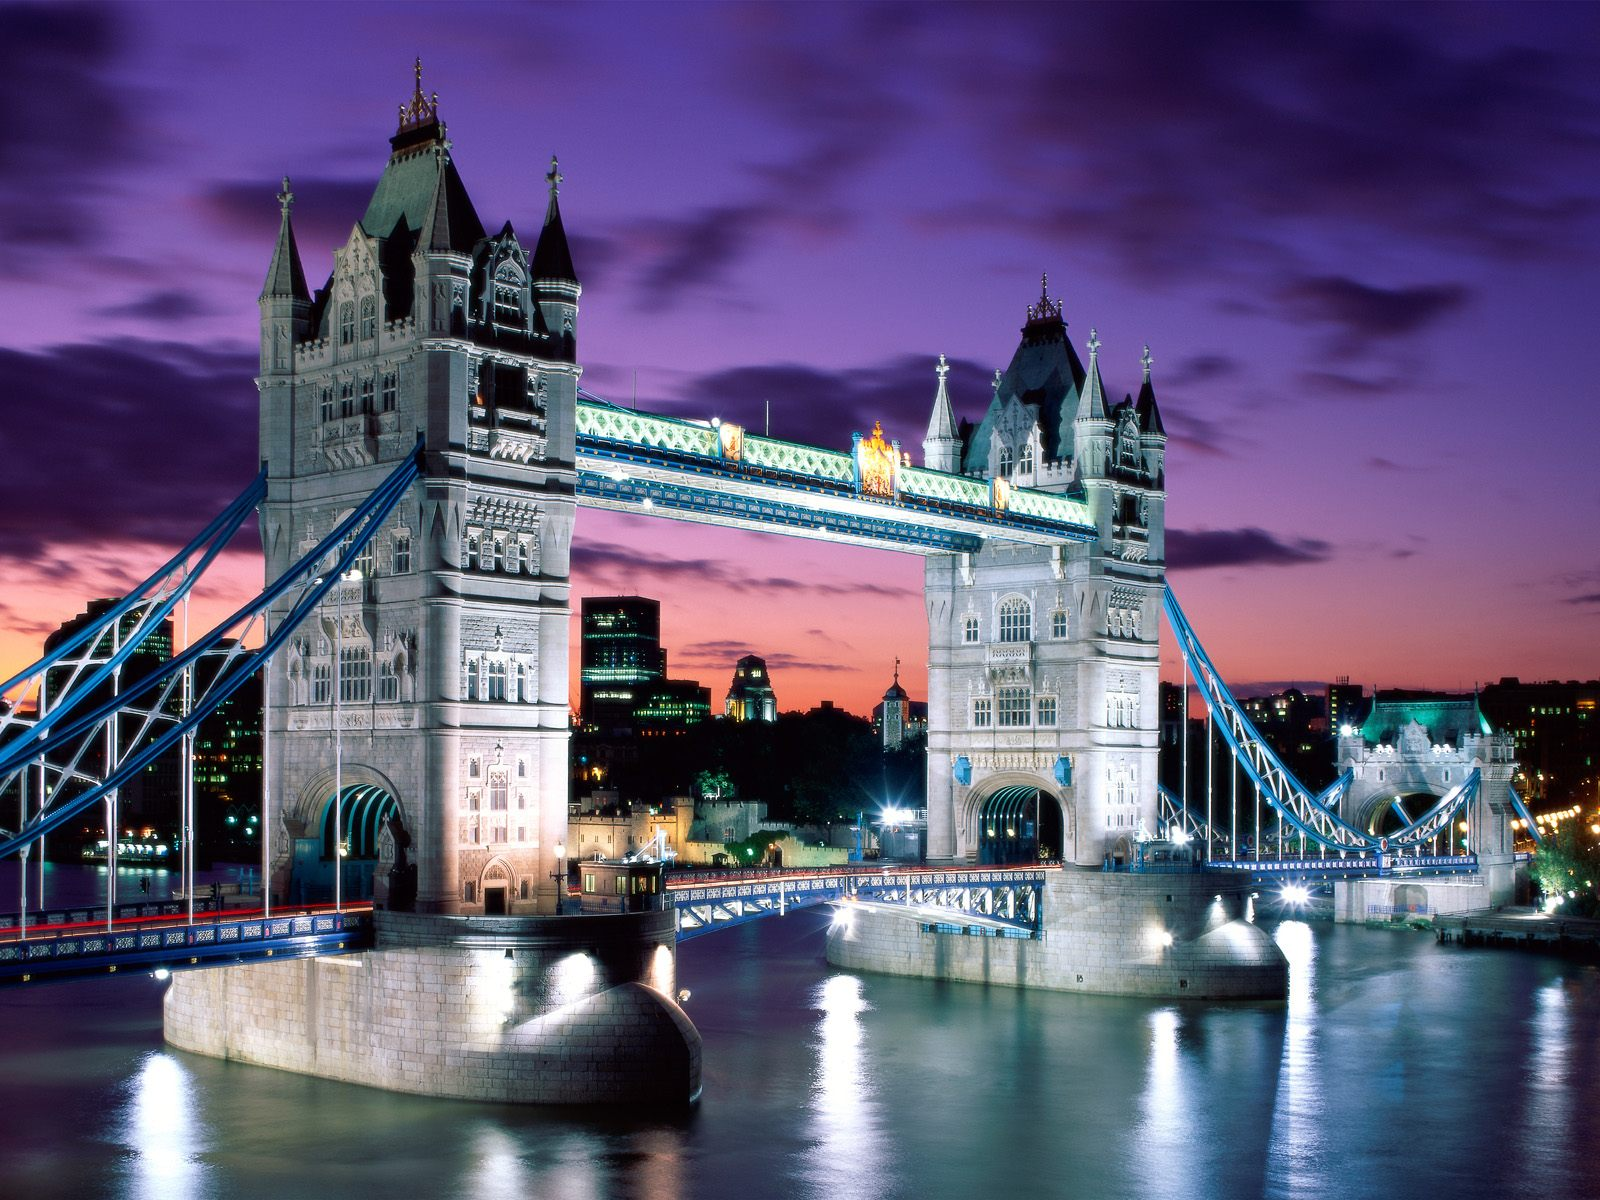 London, England - Great Britain Wallpaper (31748893) - Fanpop